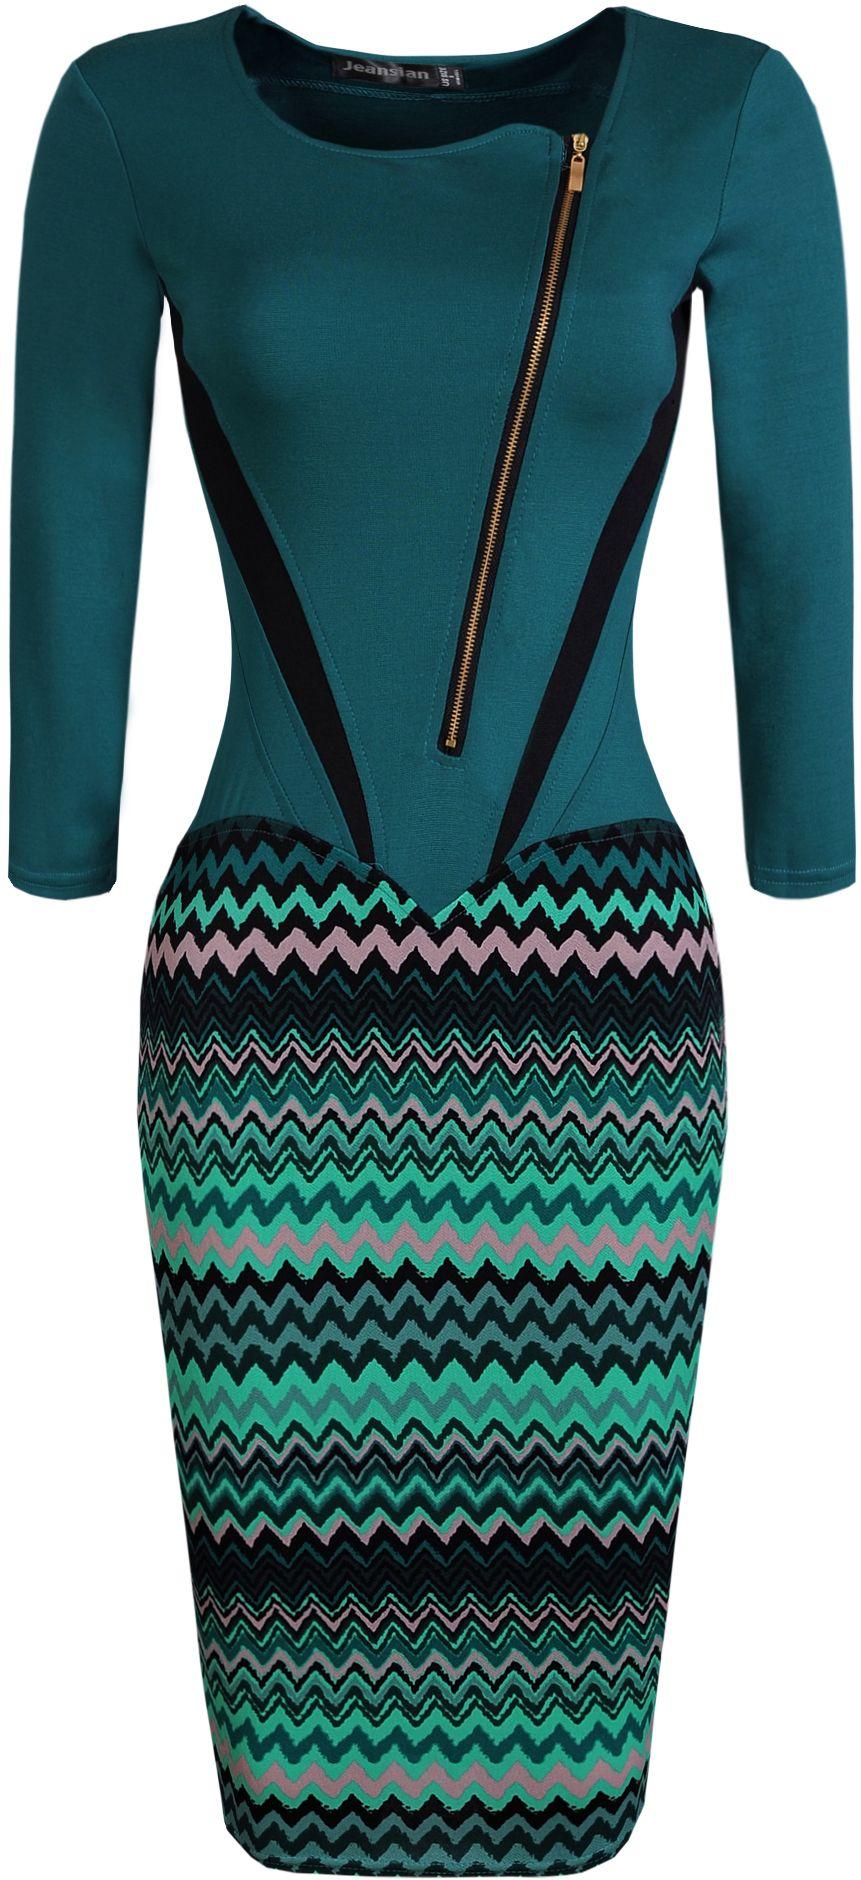 jeansian Women\'s Office Lady Slim Zipper Evening Gowns Pencil ...